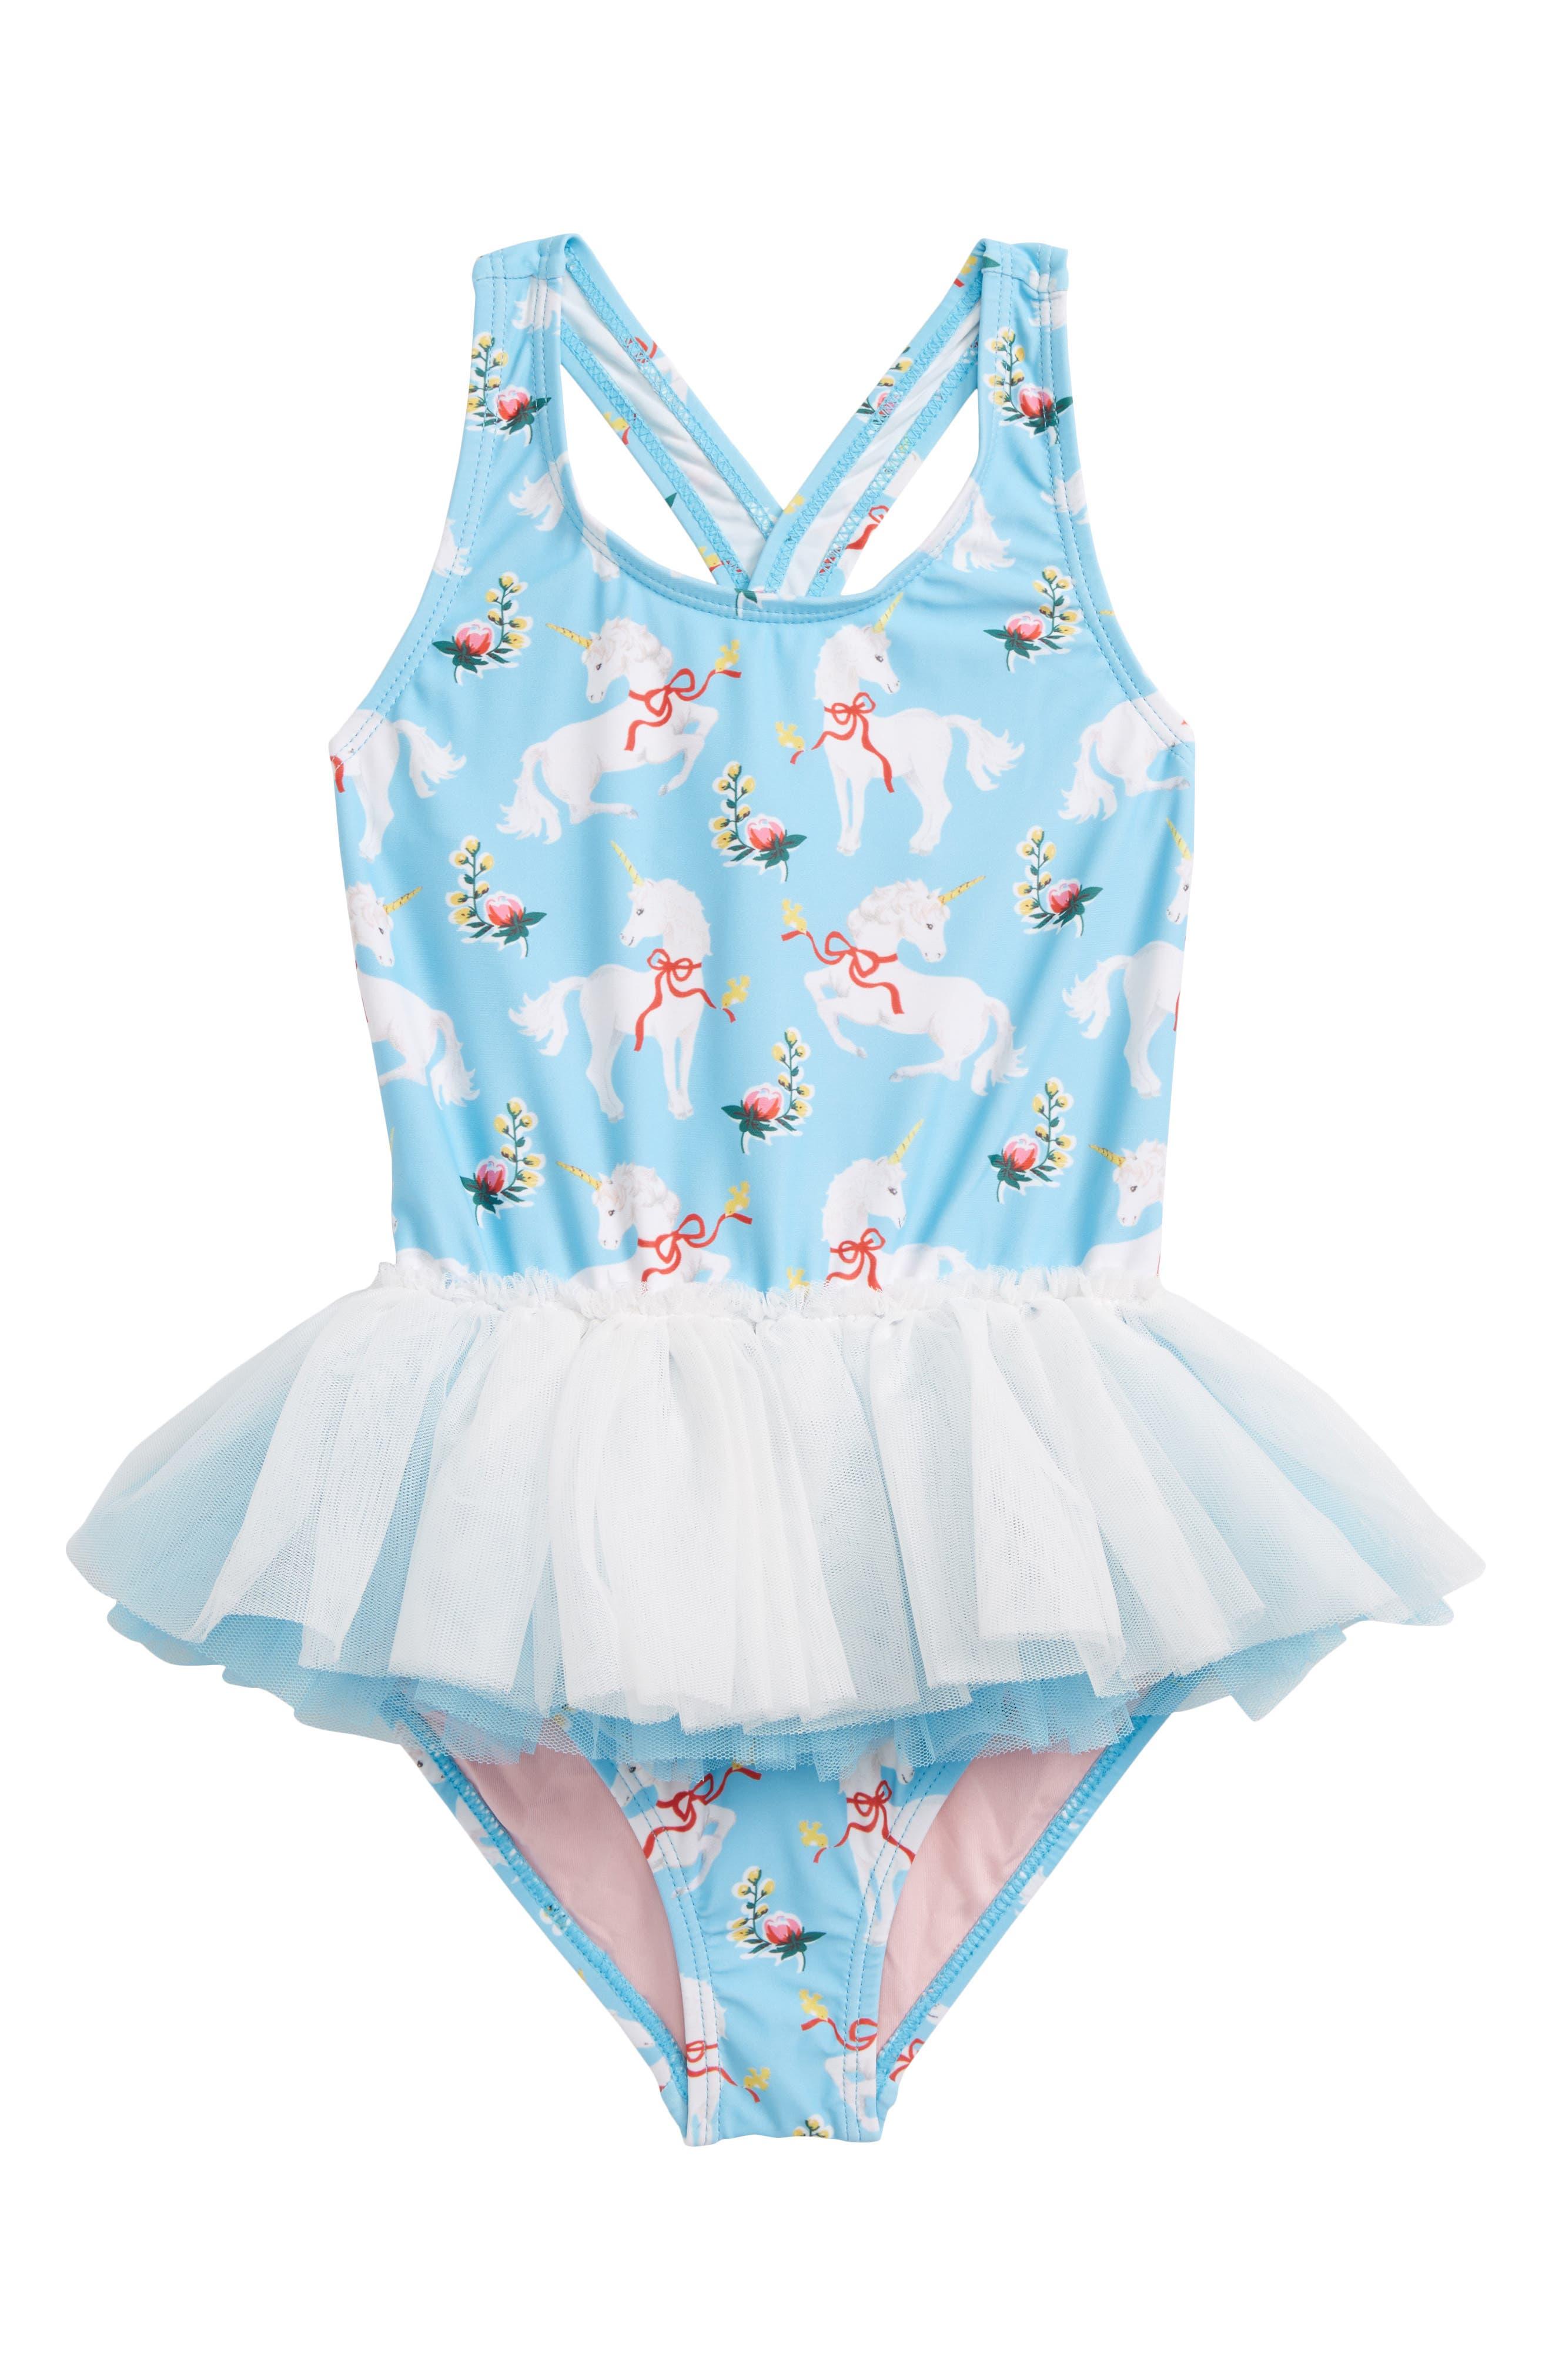 Unicorns Tulle One-Piece Swimsuit,                         Main,                         color, Blue